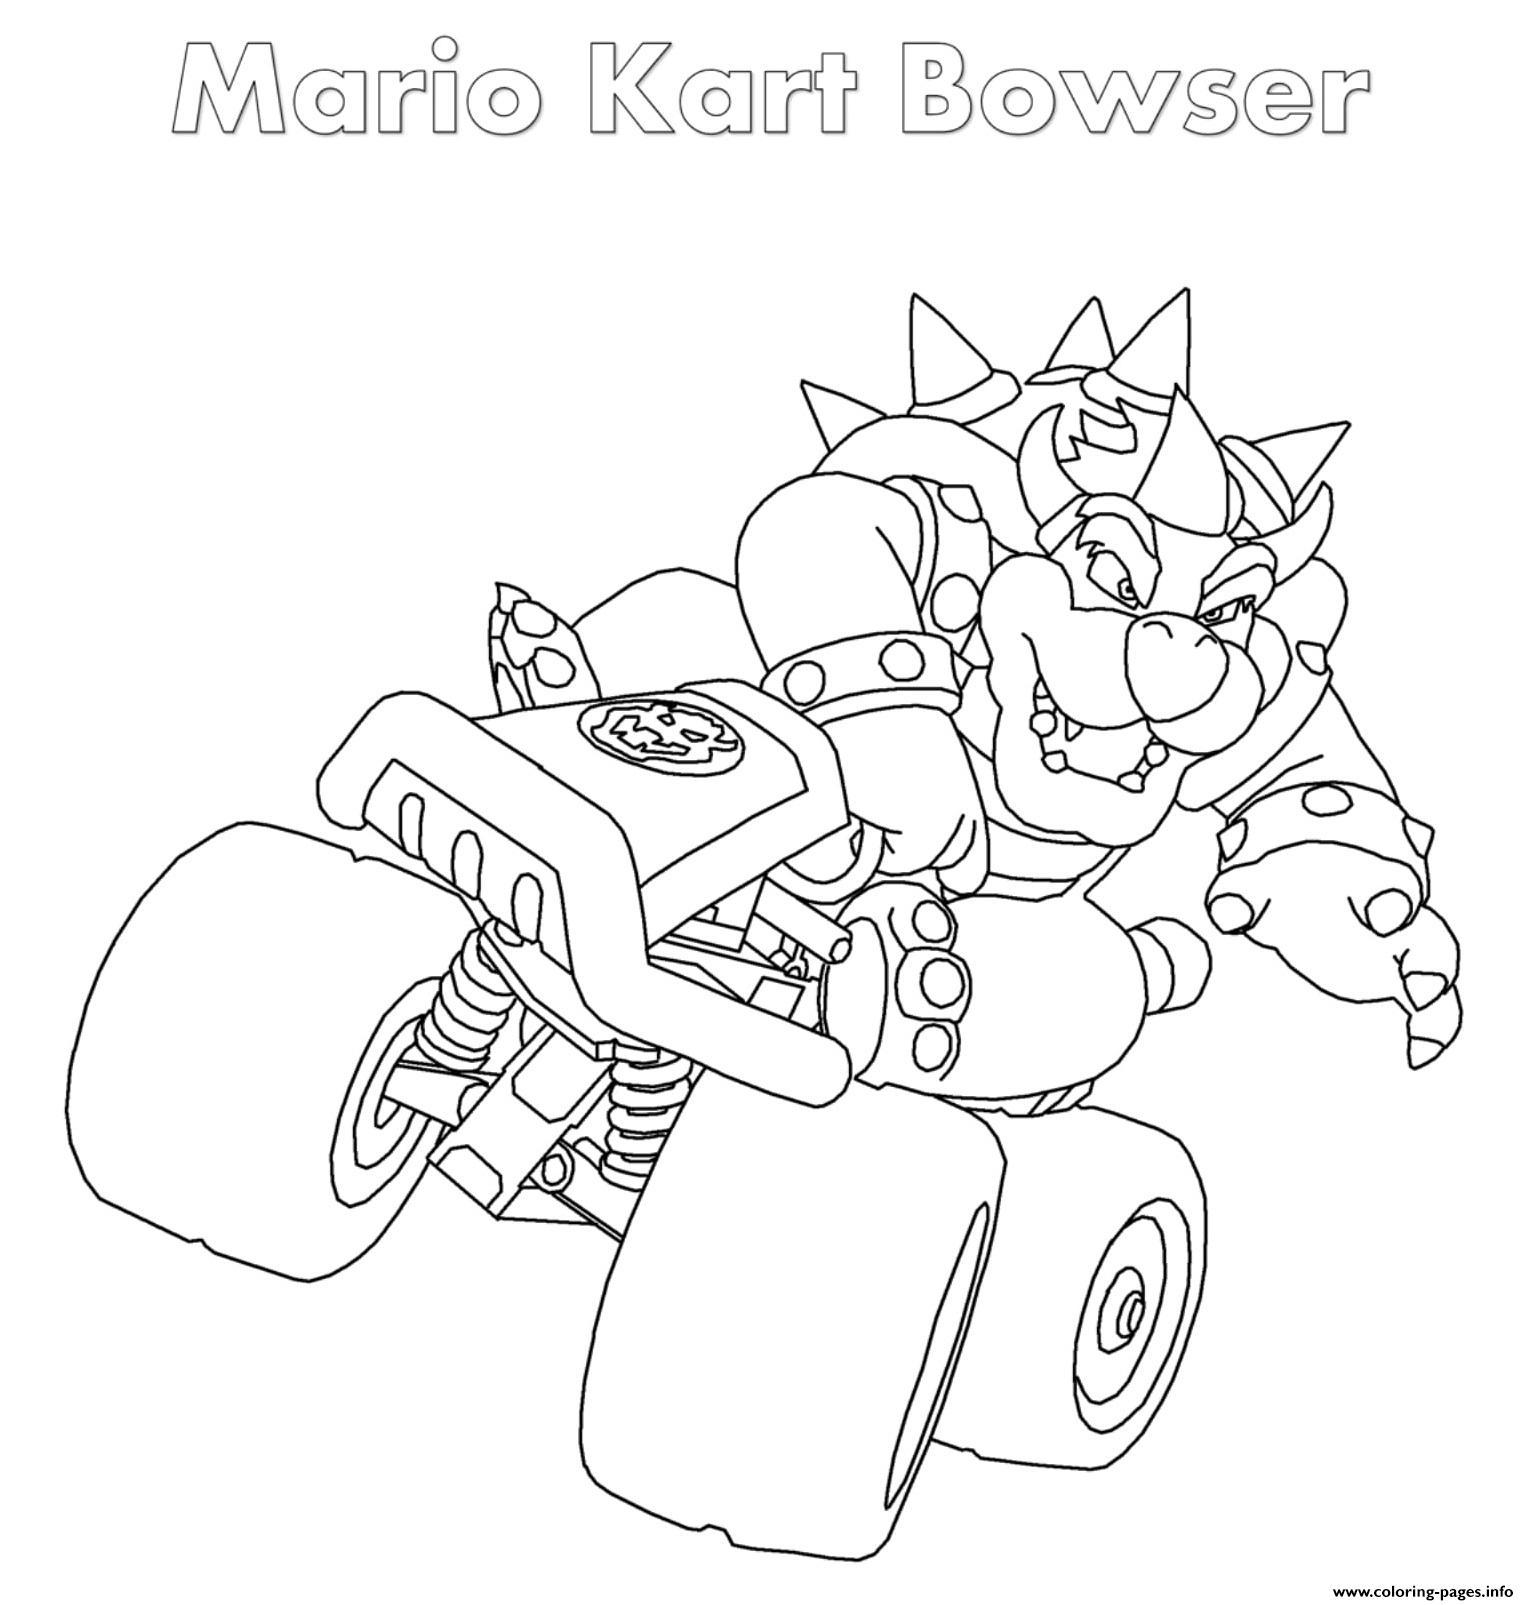 Bowser Mario Kart Nintendo Coloring Pages Printable